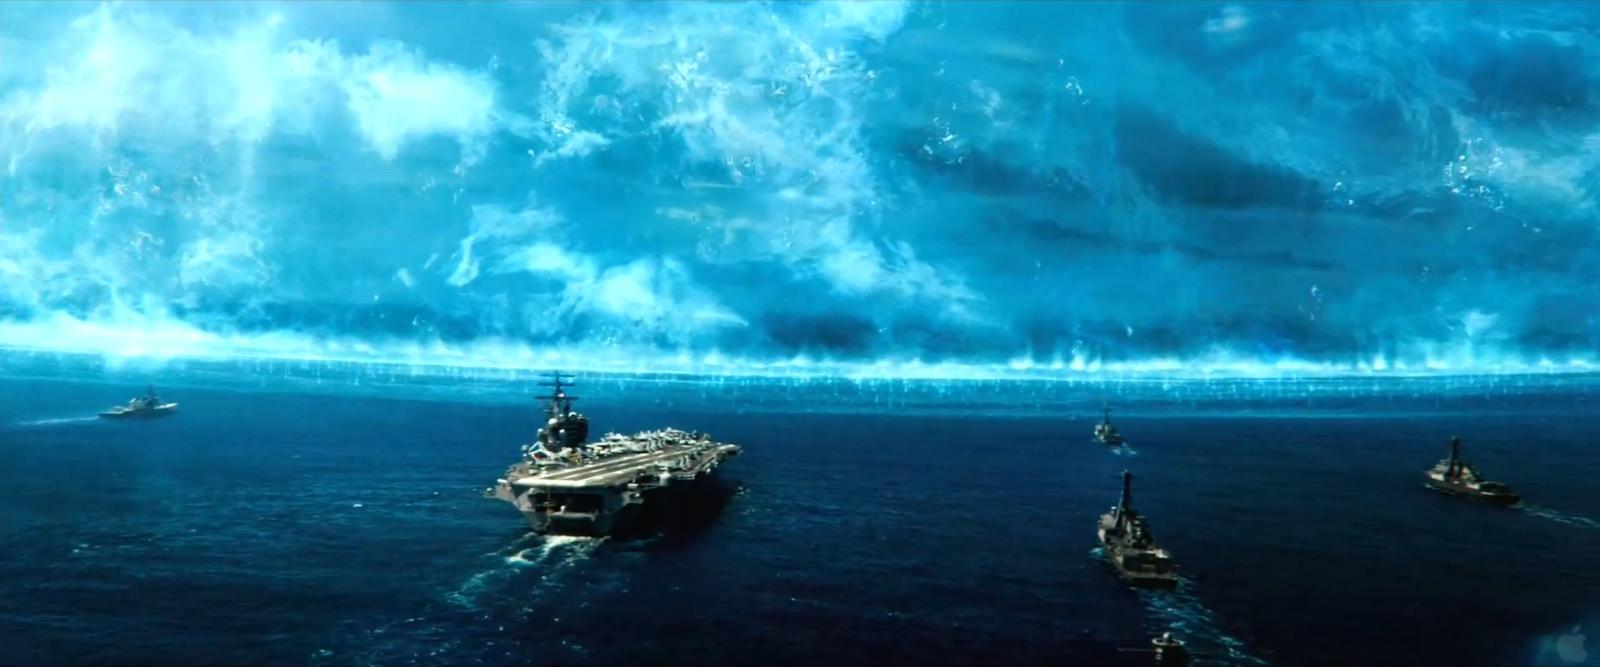 Image - Battleship fil... Brooklyn Decker Wiki